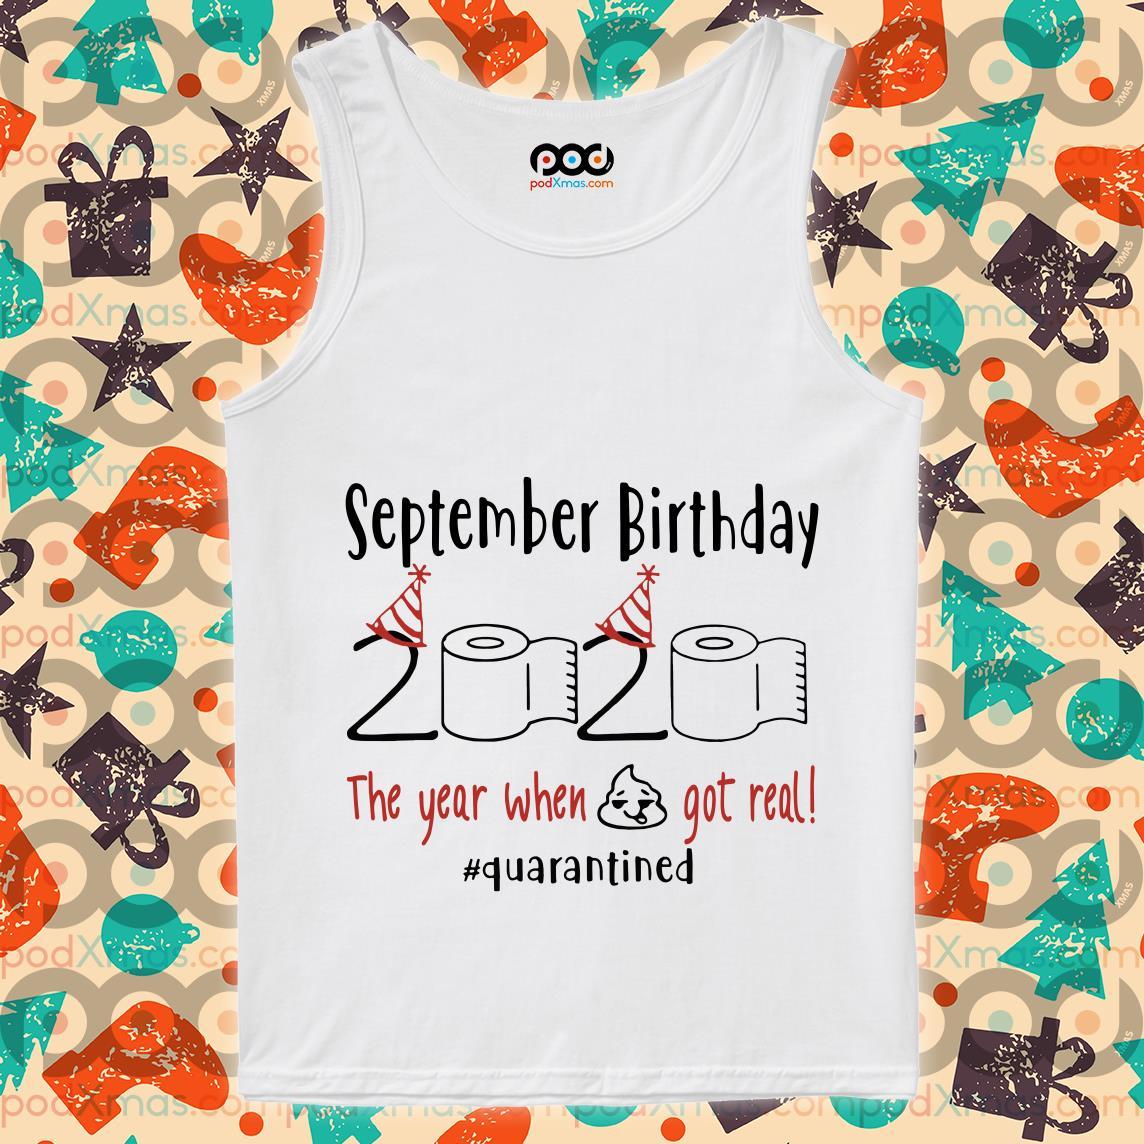 September Birthday 2020 Quarantined T-tank top